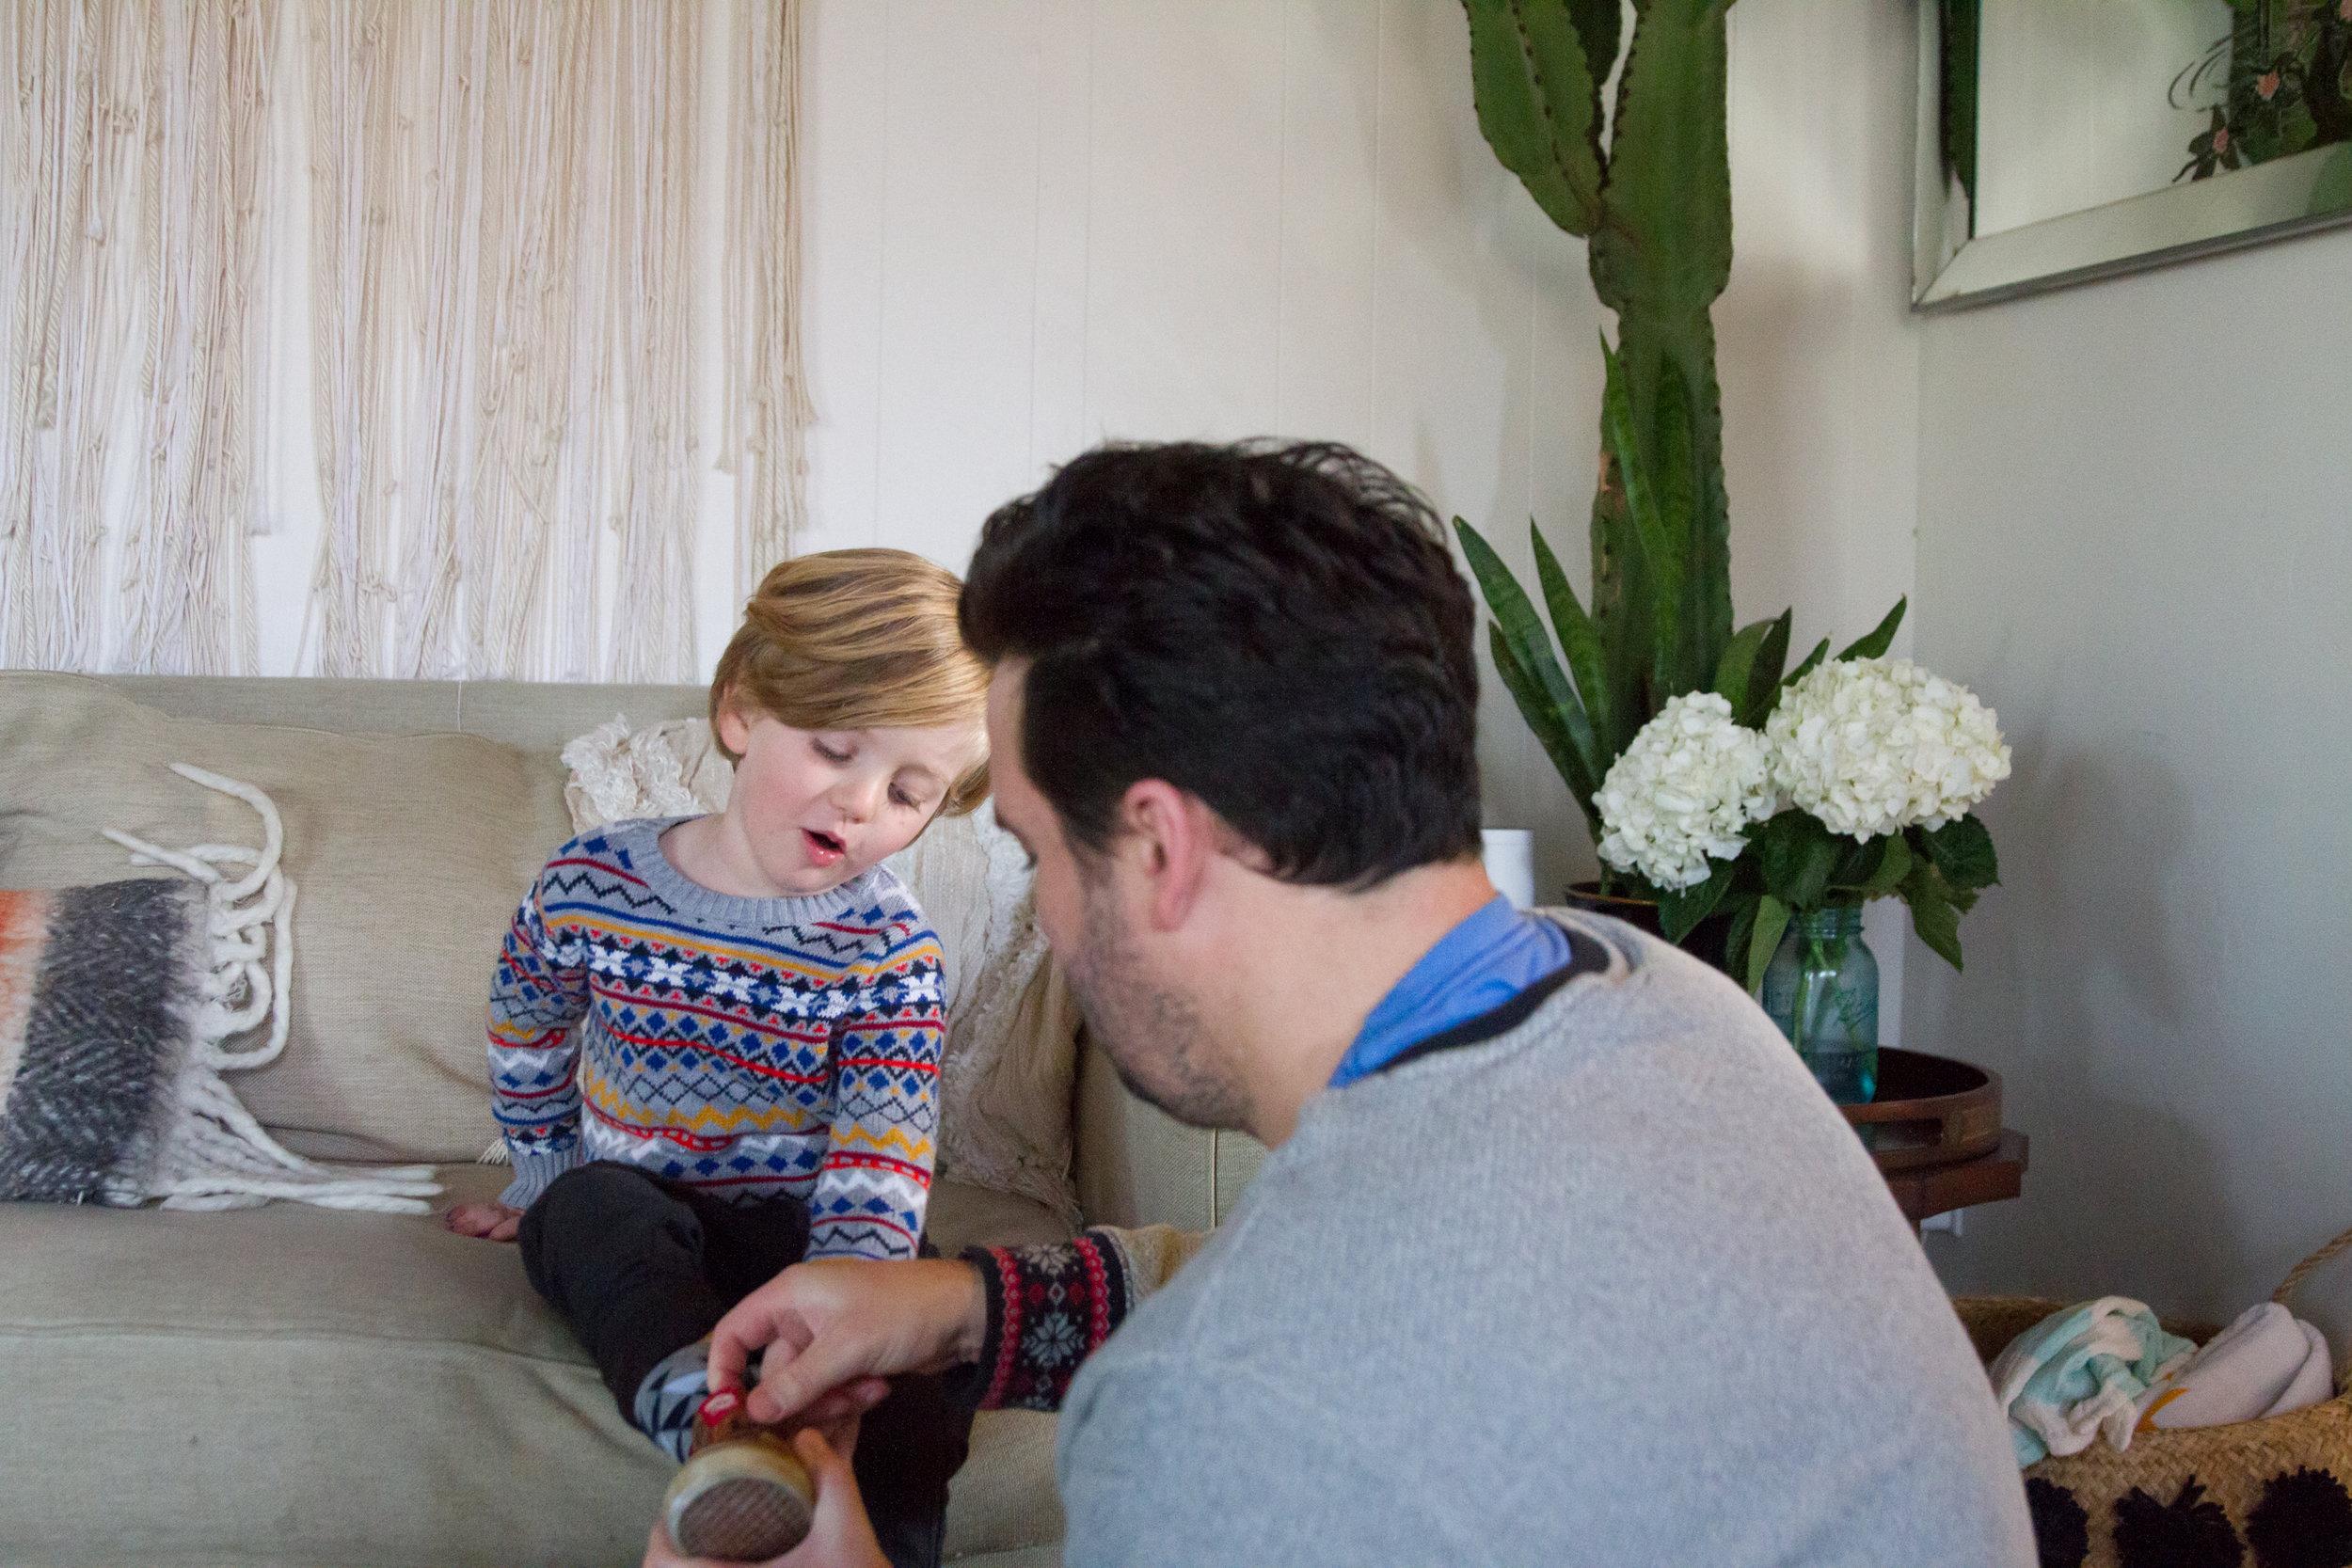 indoor-family-photos-plants.jpg